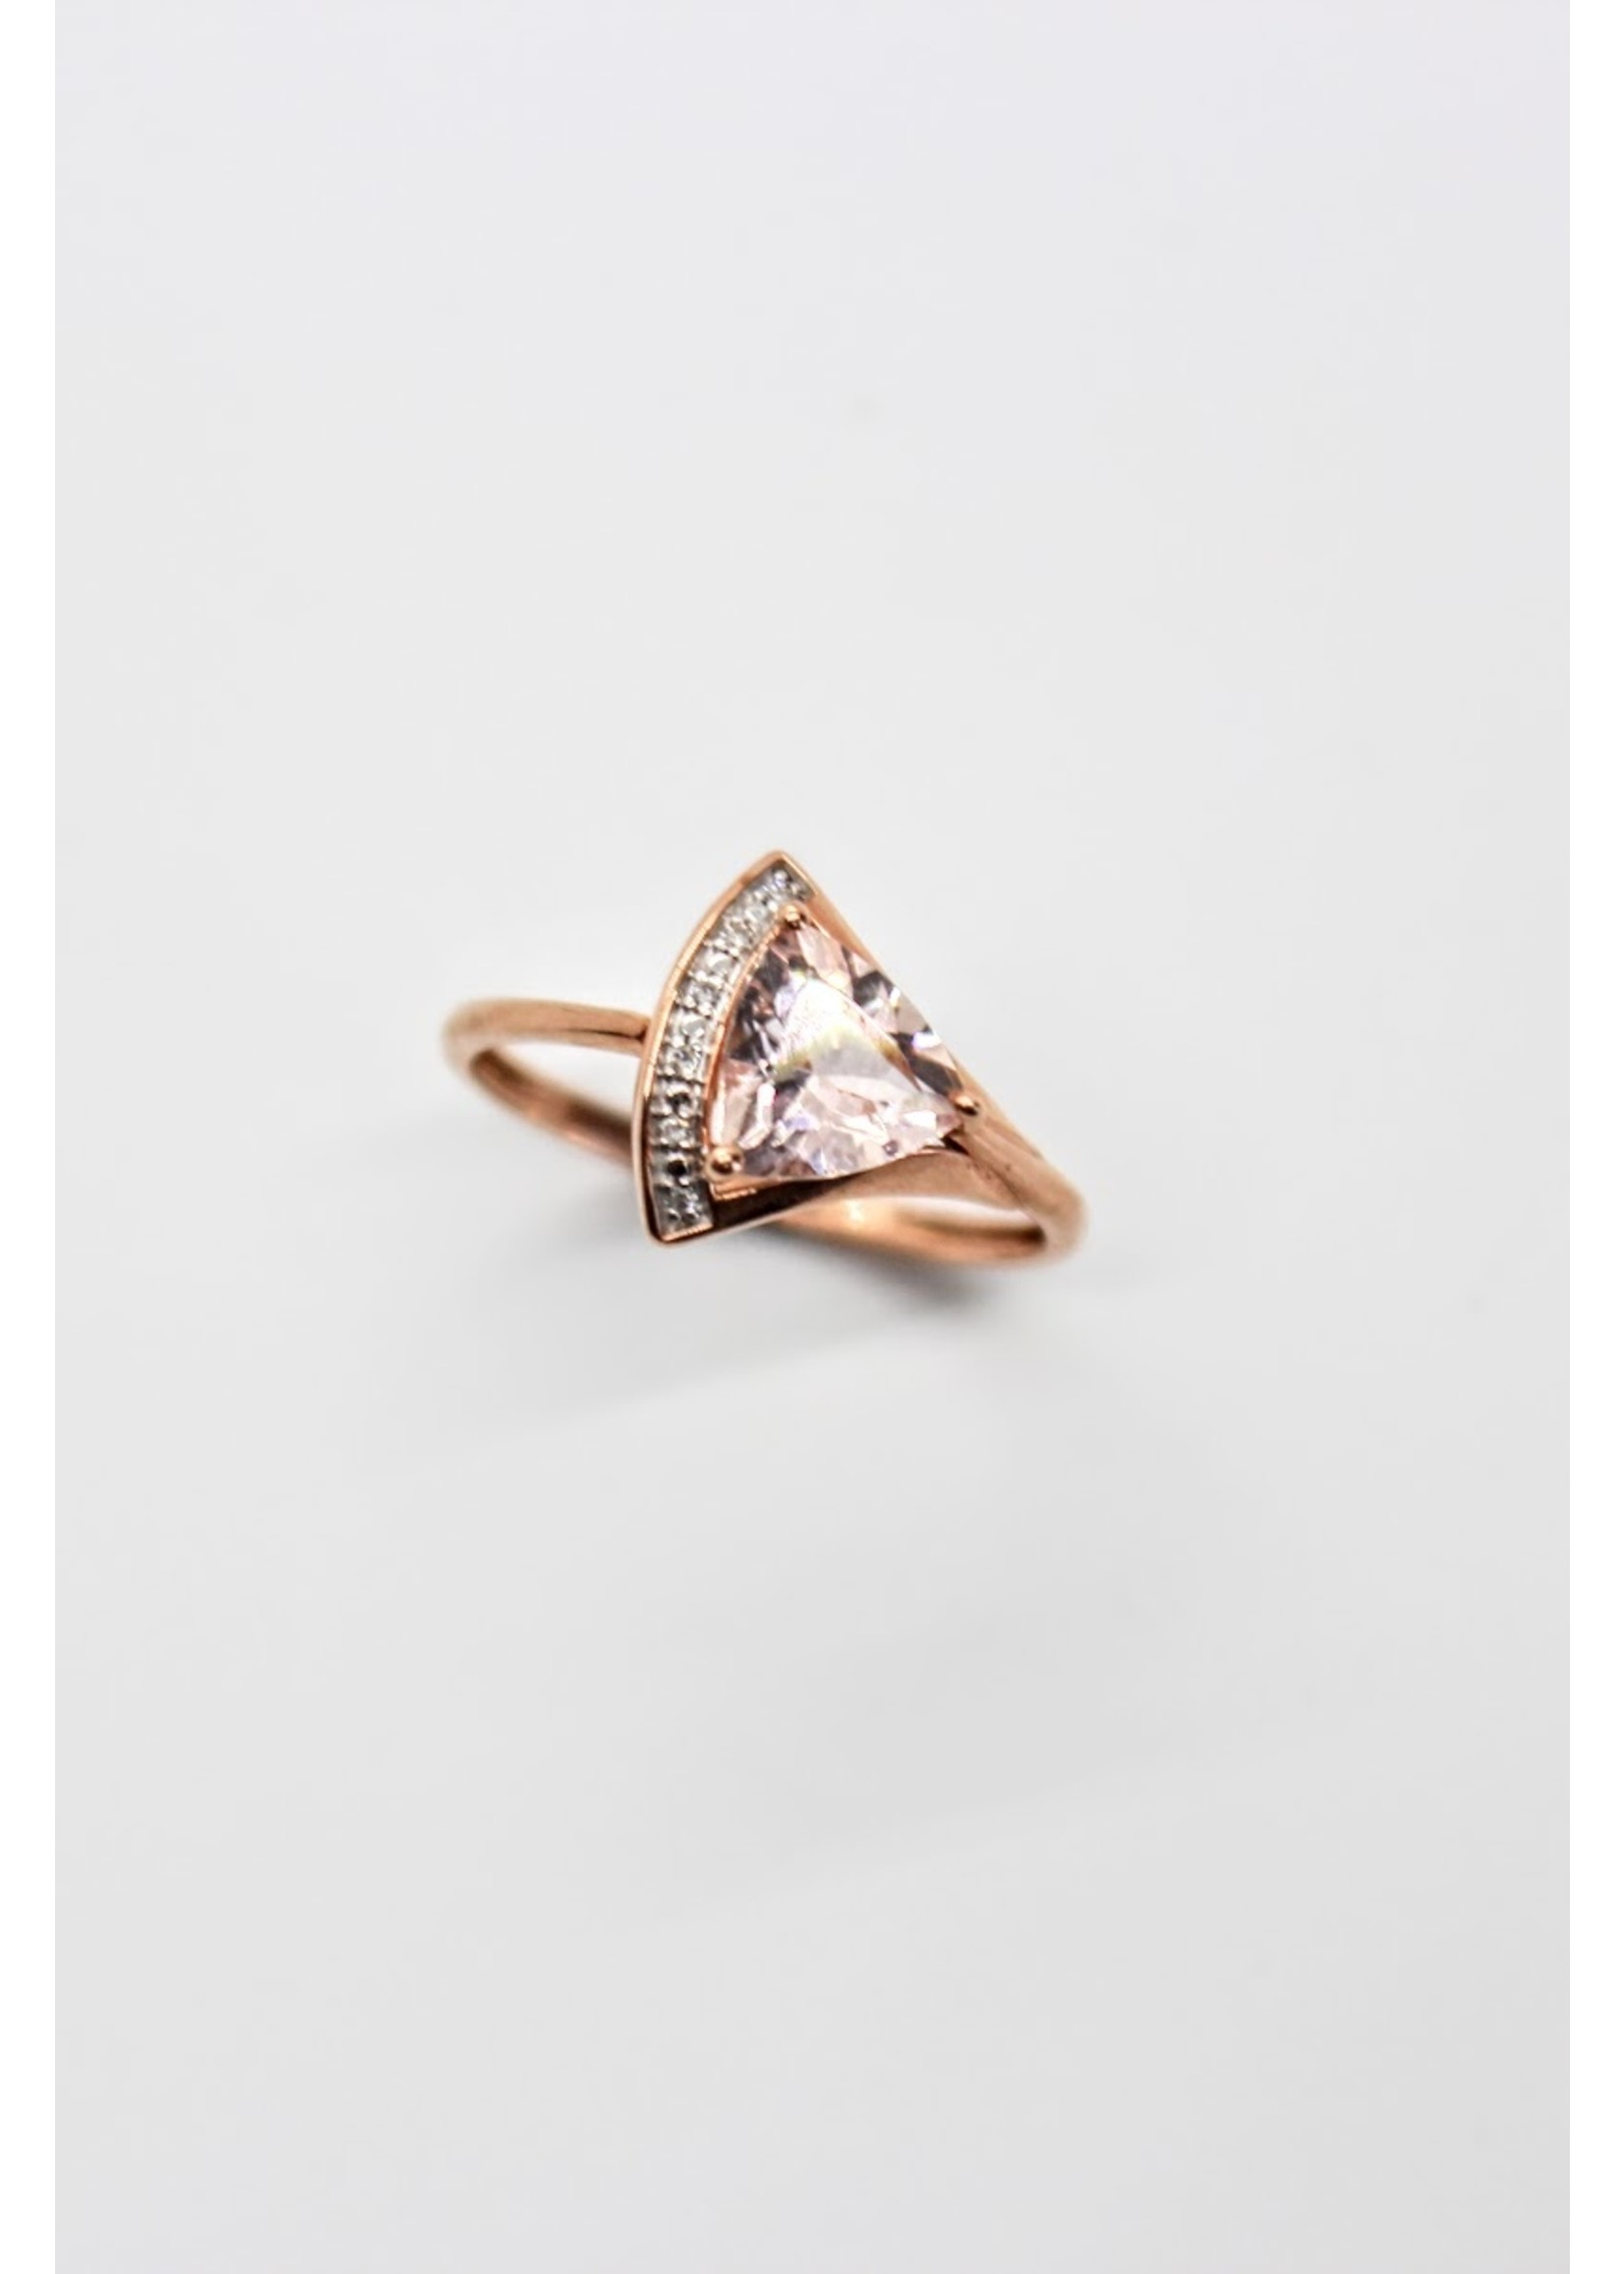 Bague triangle Or rose 10K avec morganite et diamants